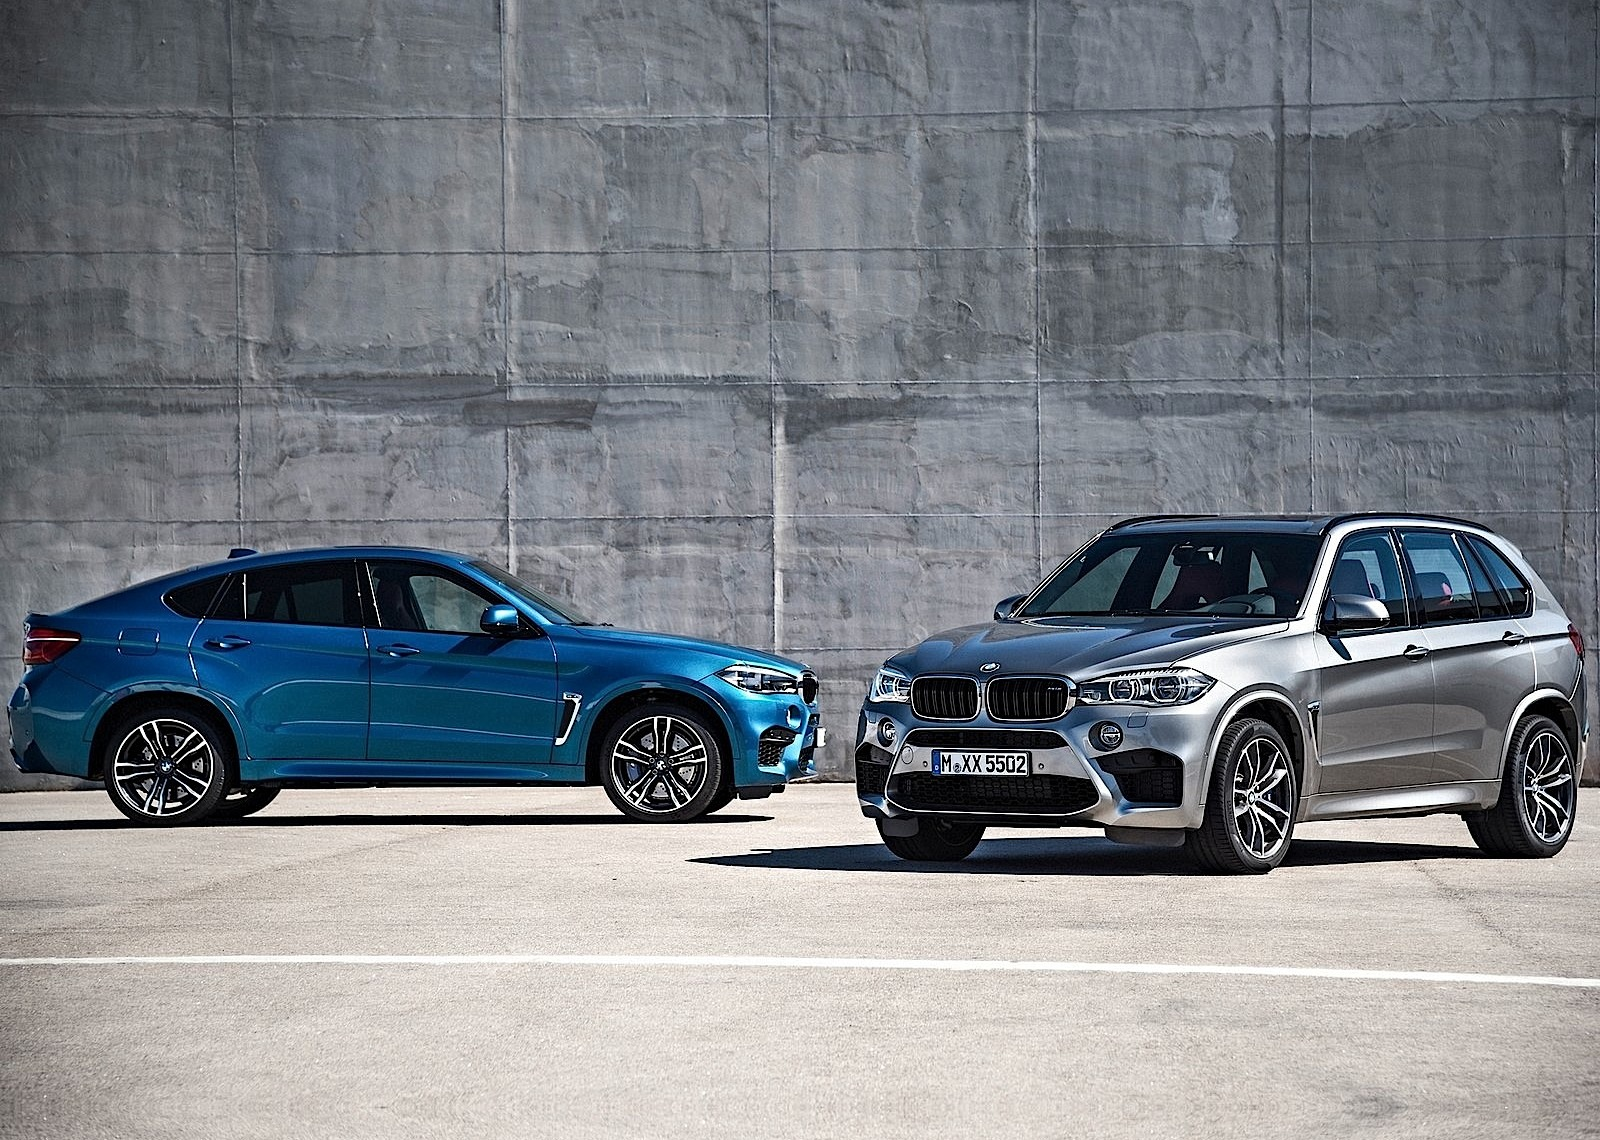 BMW X5M specs & photos - 2014, 2015, 2016, 2017, 2018, 2019 - autoevolution